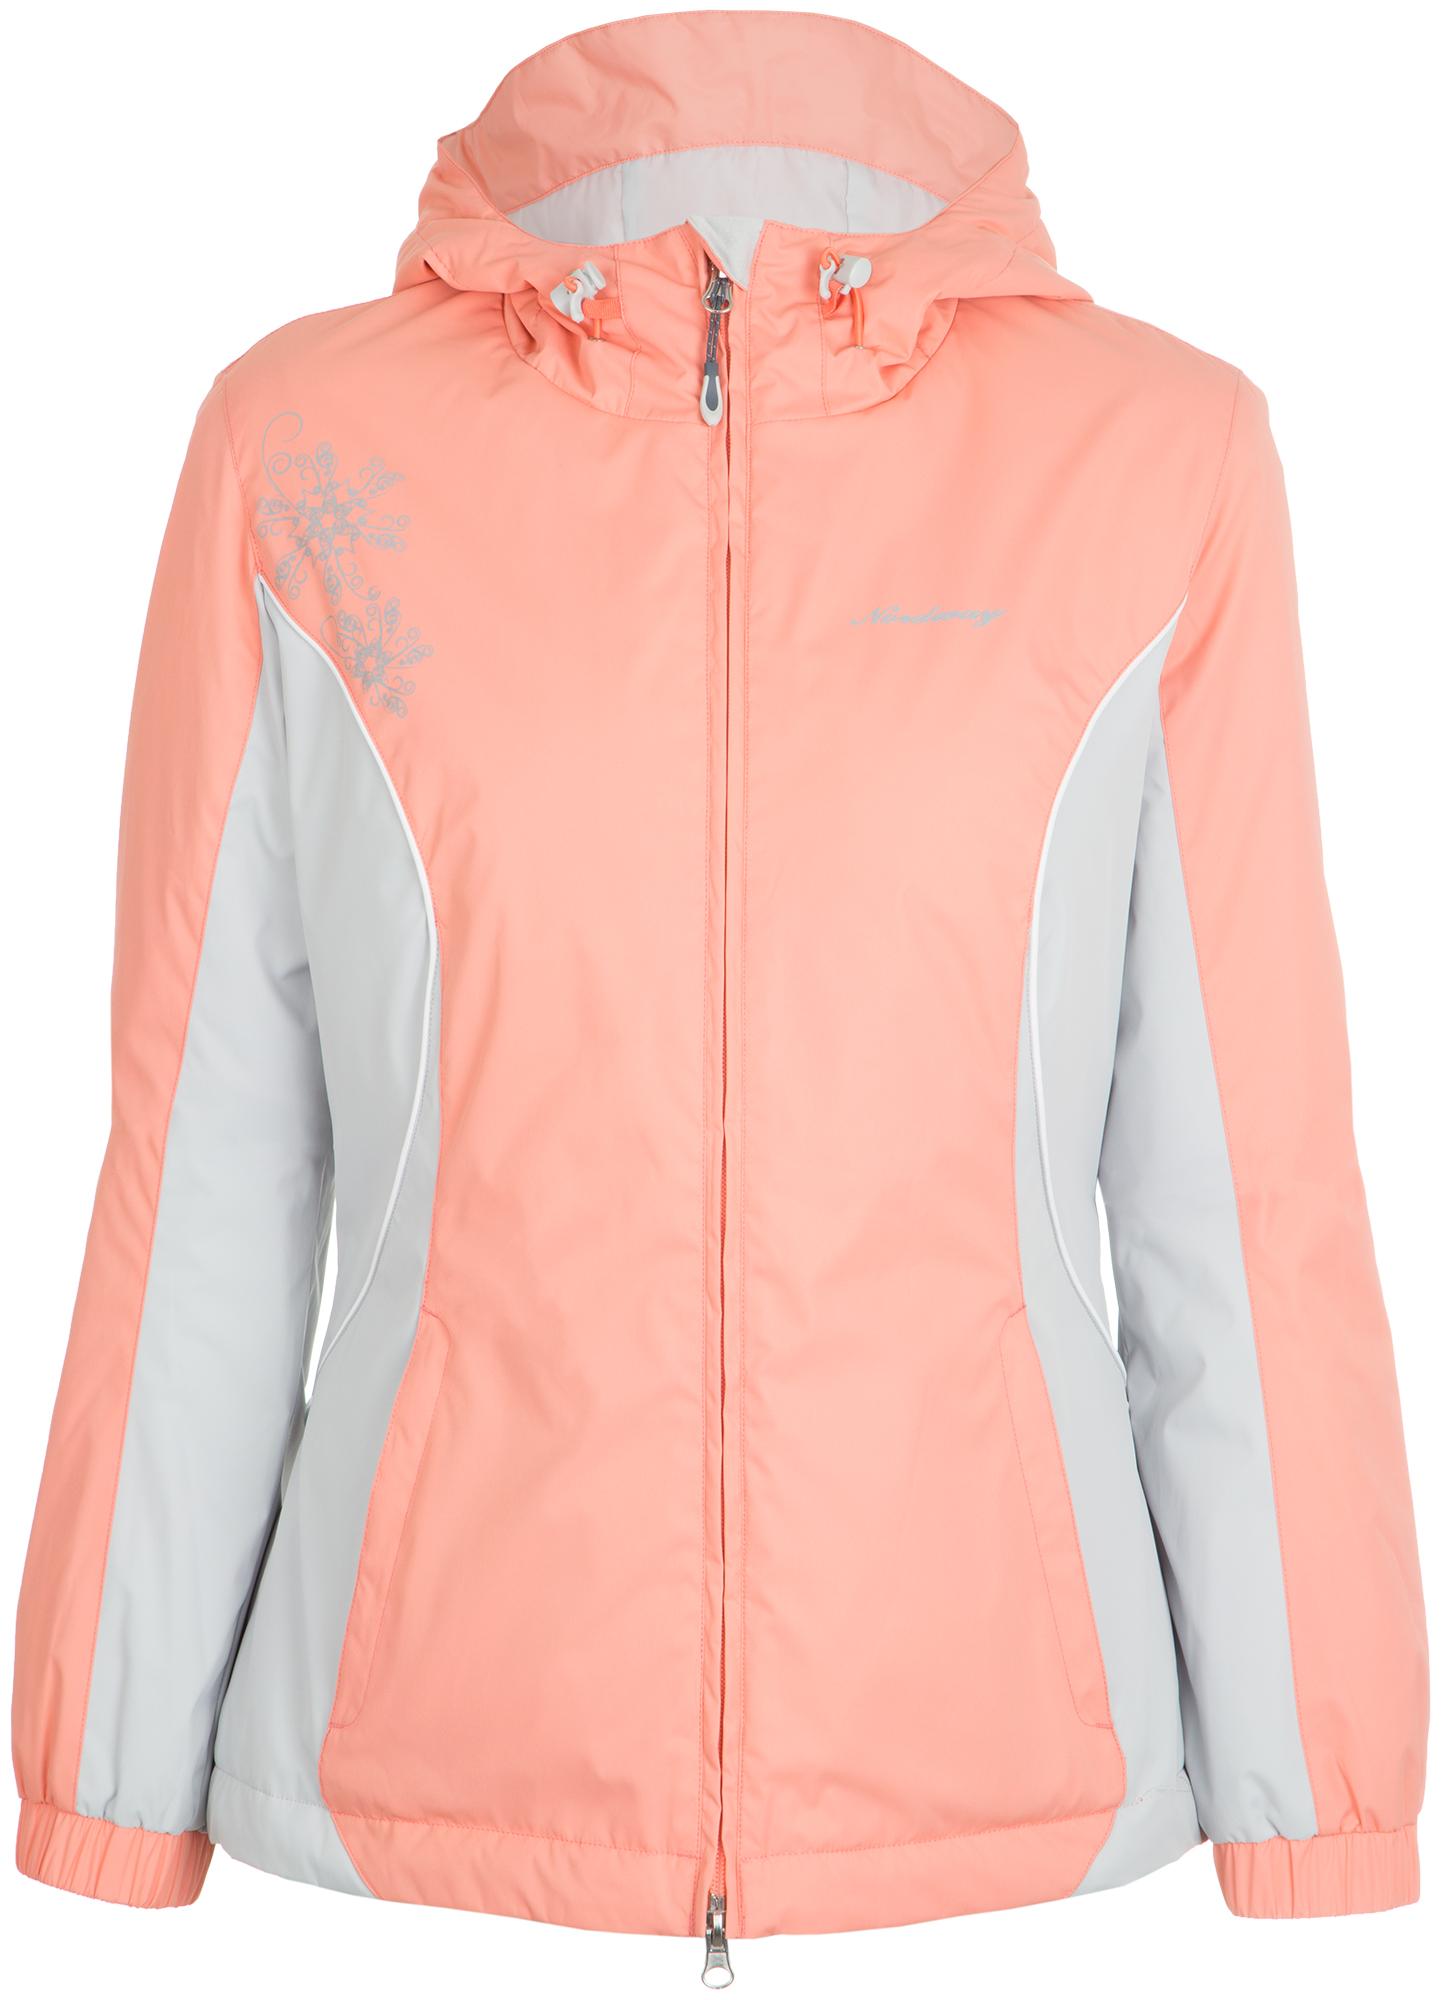 Nordway Куртка утепленная женская Nordway, размер 48 prada утепленная куртка на молнии